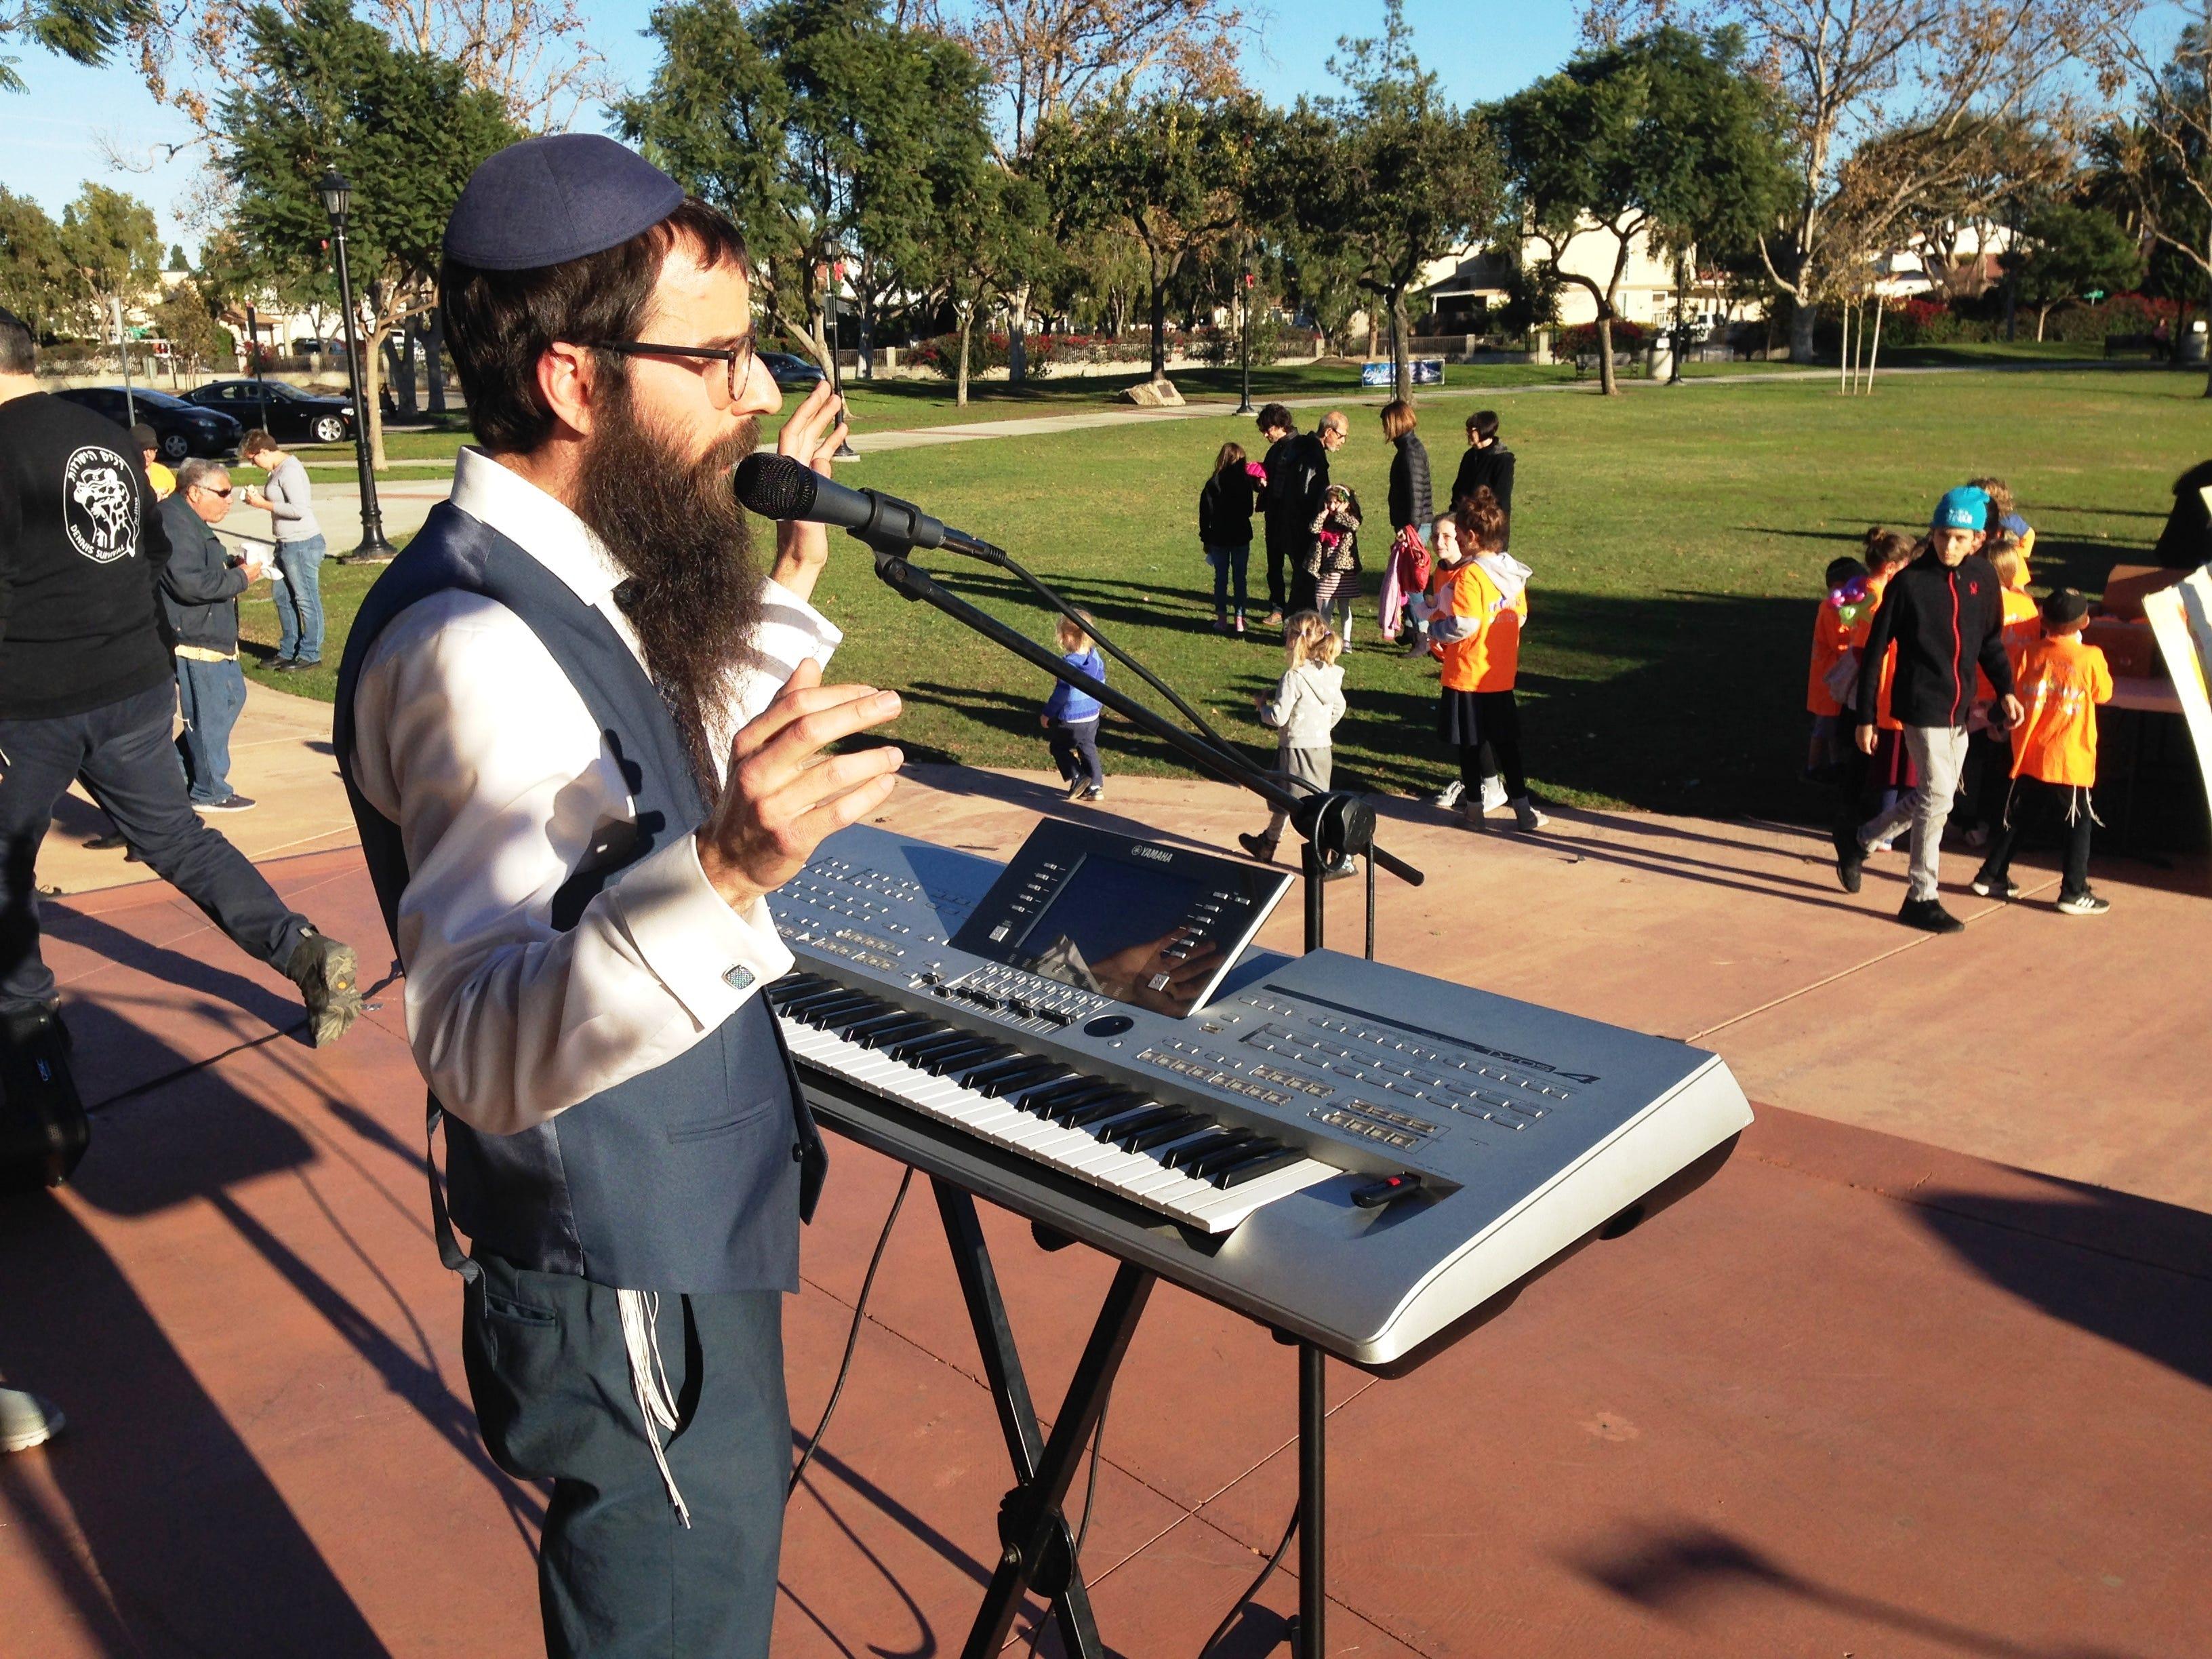 Rabbi Yosef Muchnik performs Sunday at Chabad of Camarillo's 16th annual Hanukkah Festival and Grand Menorah Lighting in Constitution Park in Camarillo.